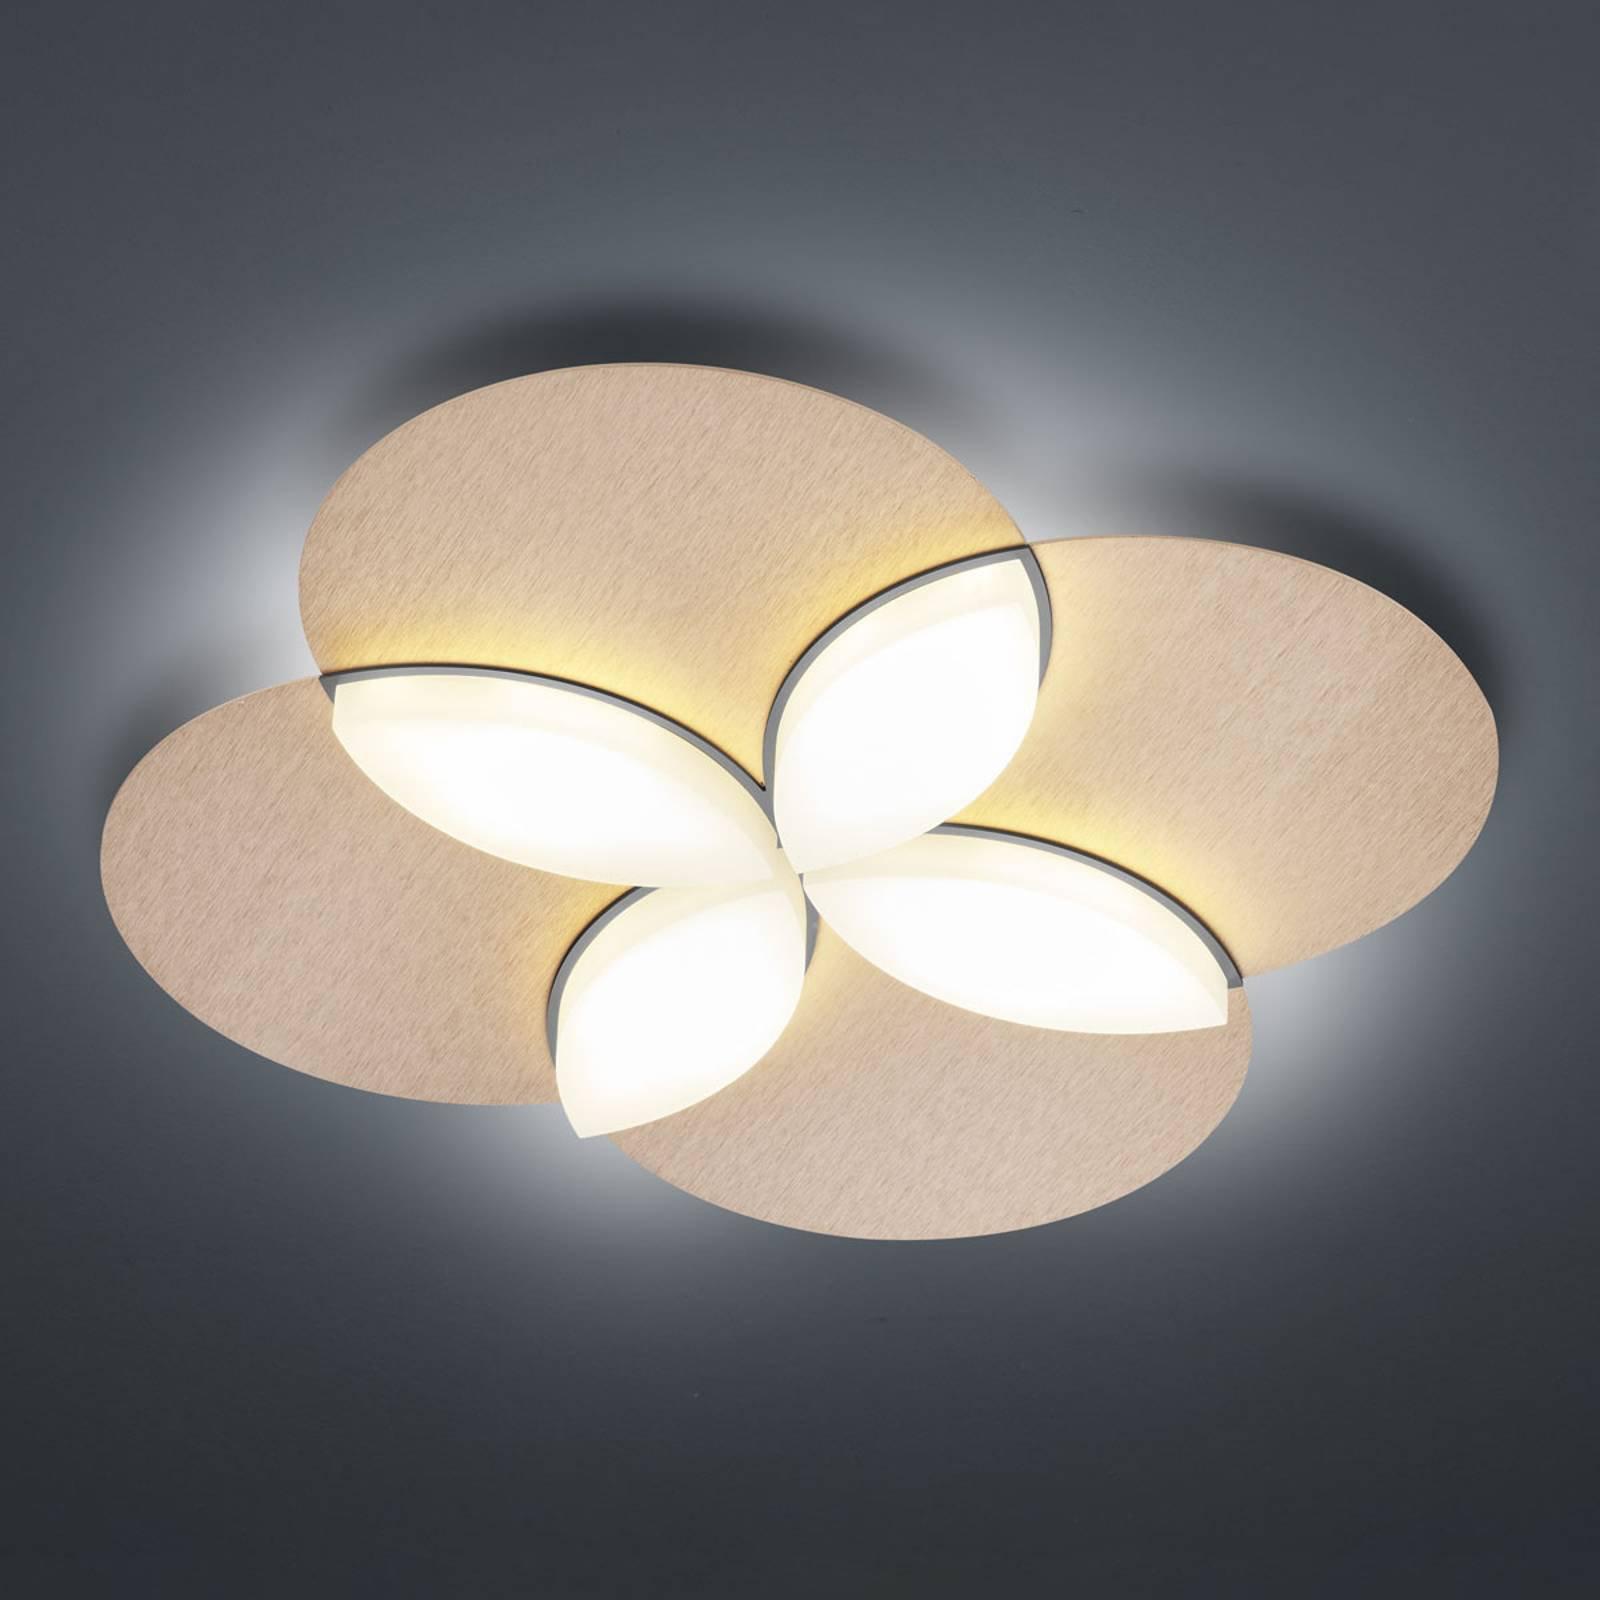 BANKAMP Spring LED-taklampe, roségull